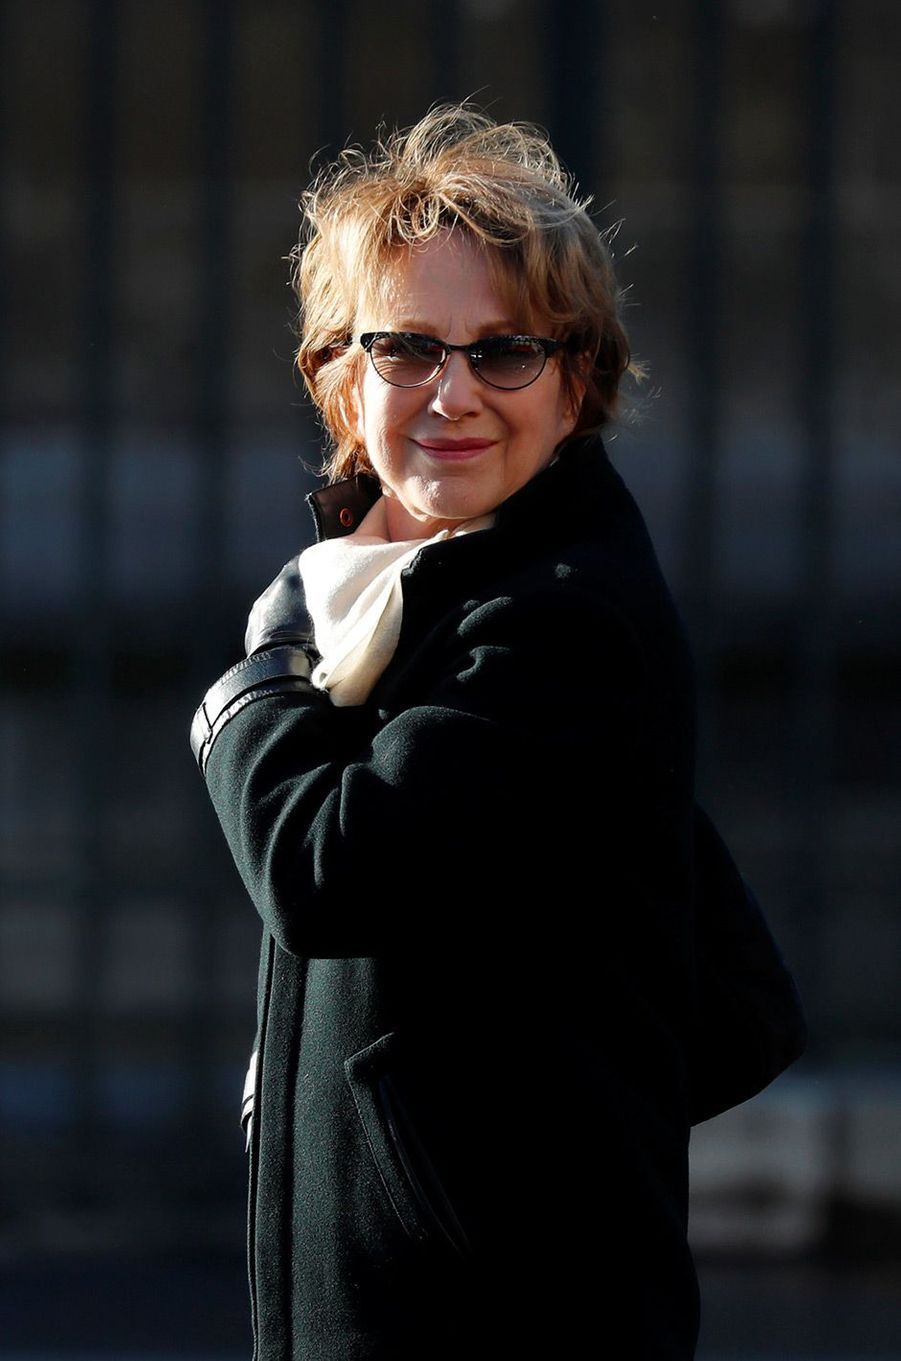 Nathalie Baye arrive à la Madeleine pour l'hommage à Johnny Hallyday